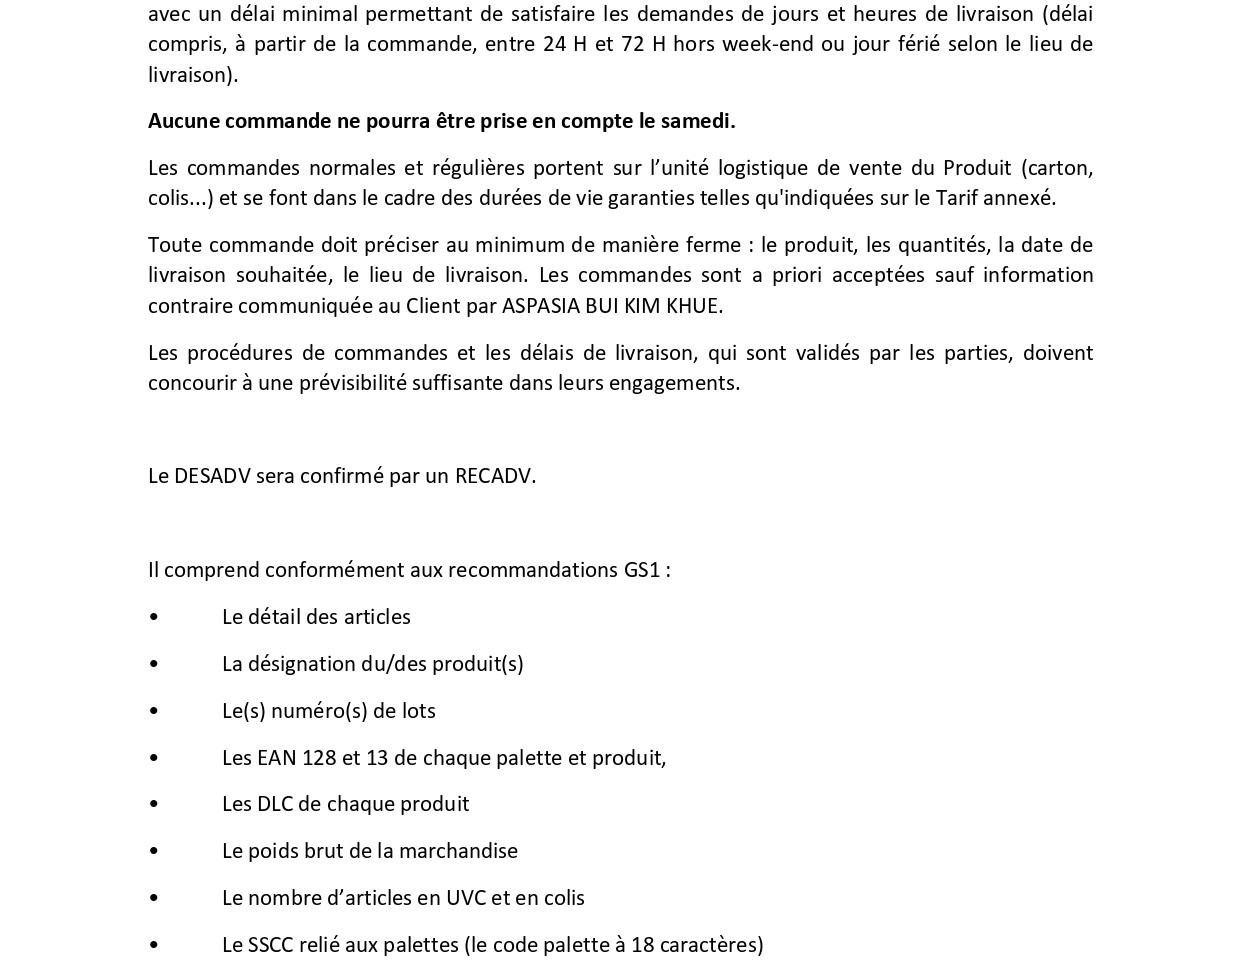 CGV ASPASIA 2020_page-0003.jpg